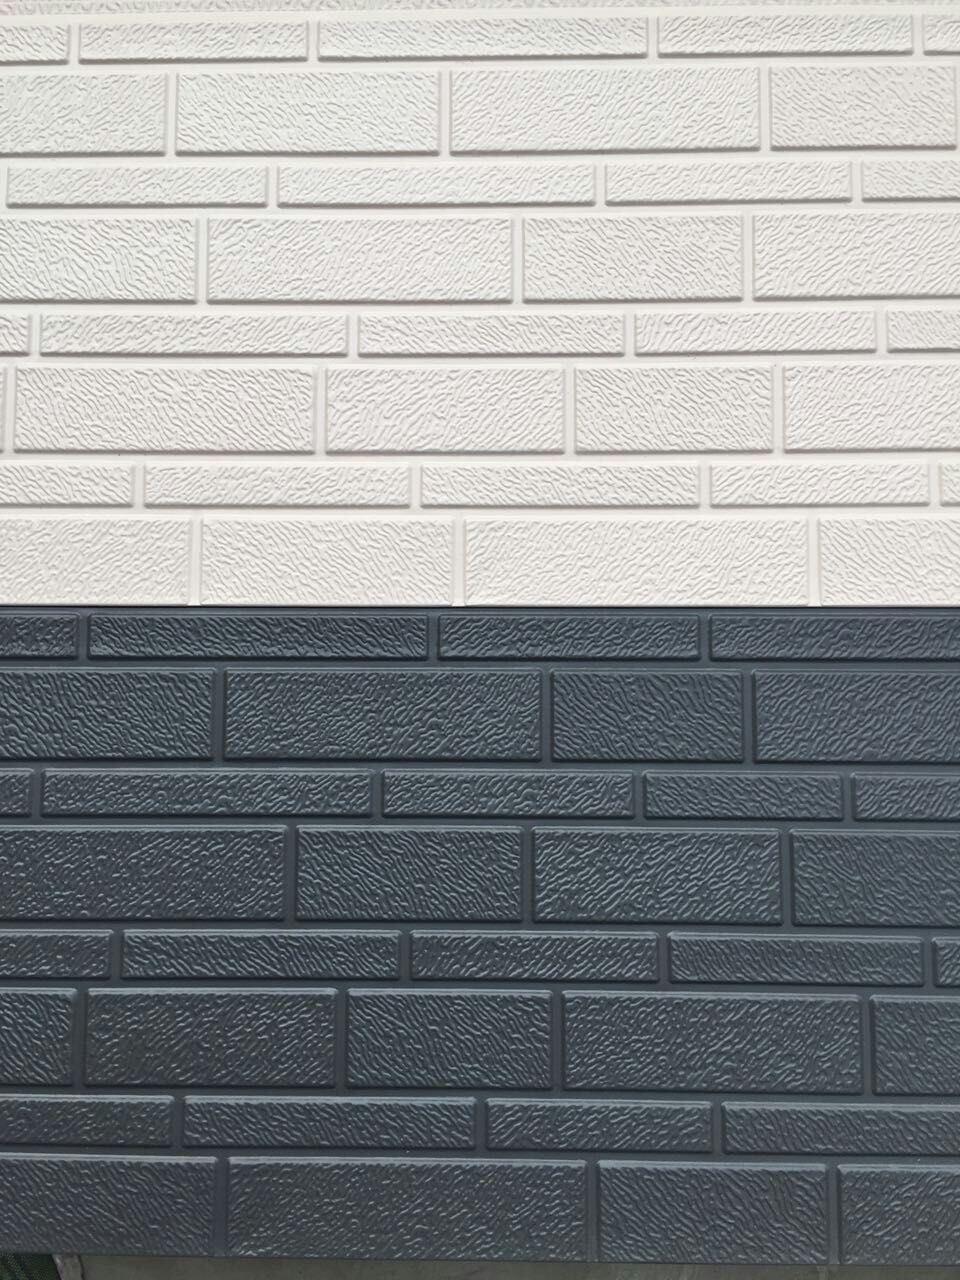 Metal Decorative PU Foam Insulated Wall Cladding